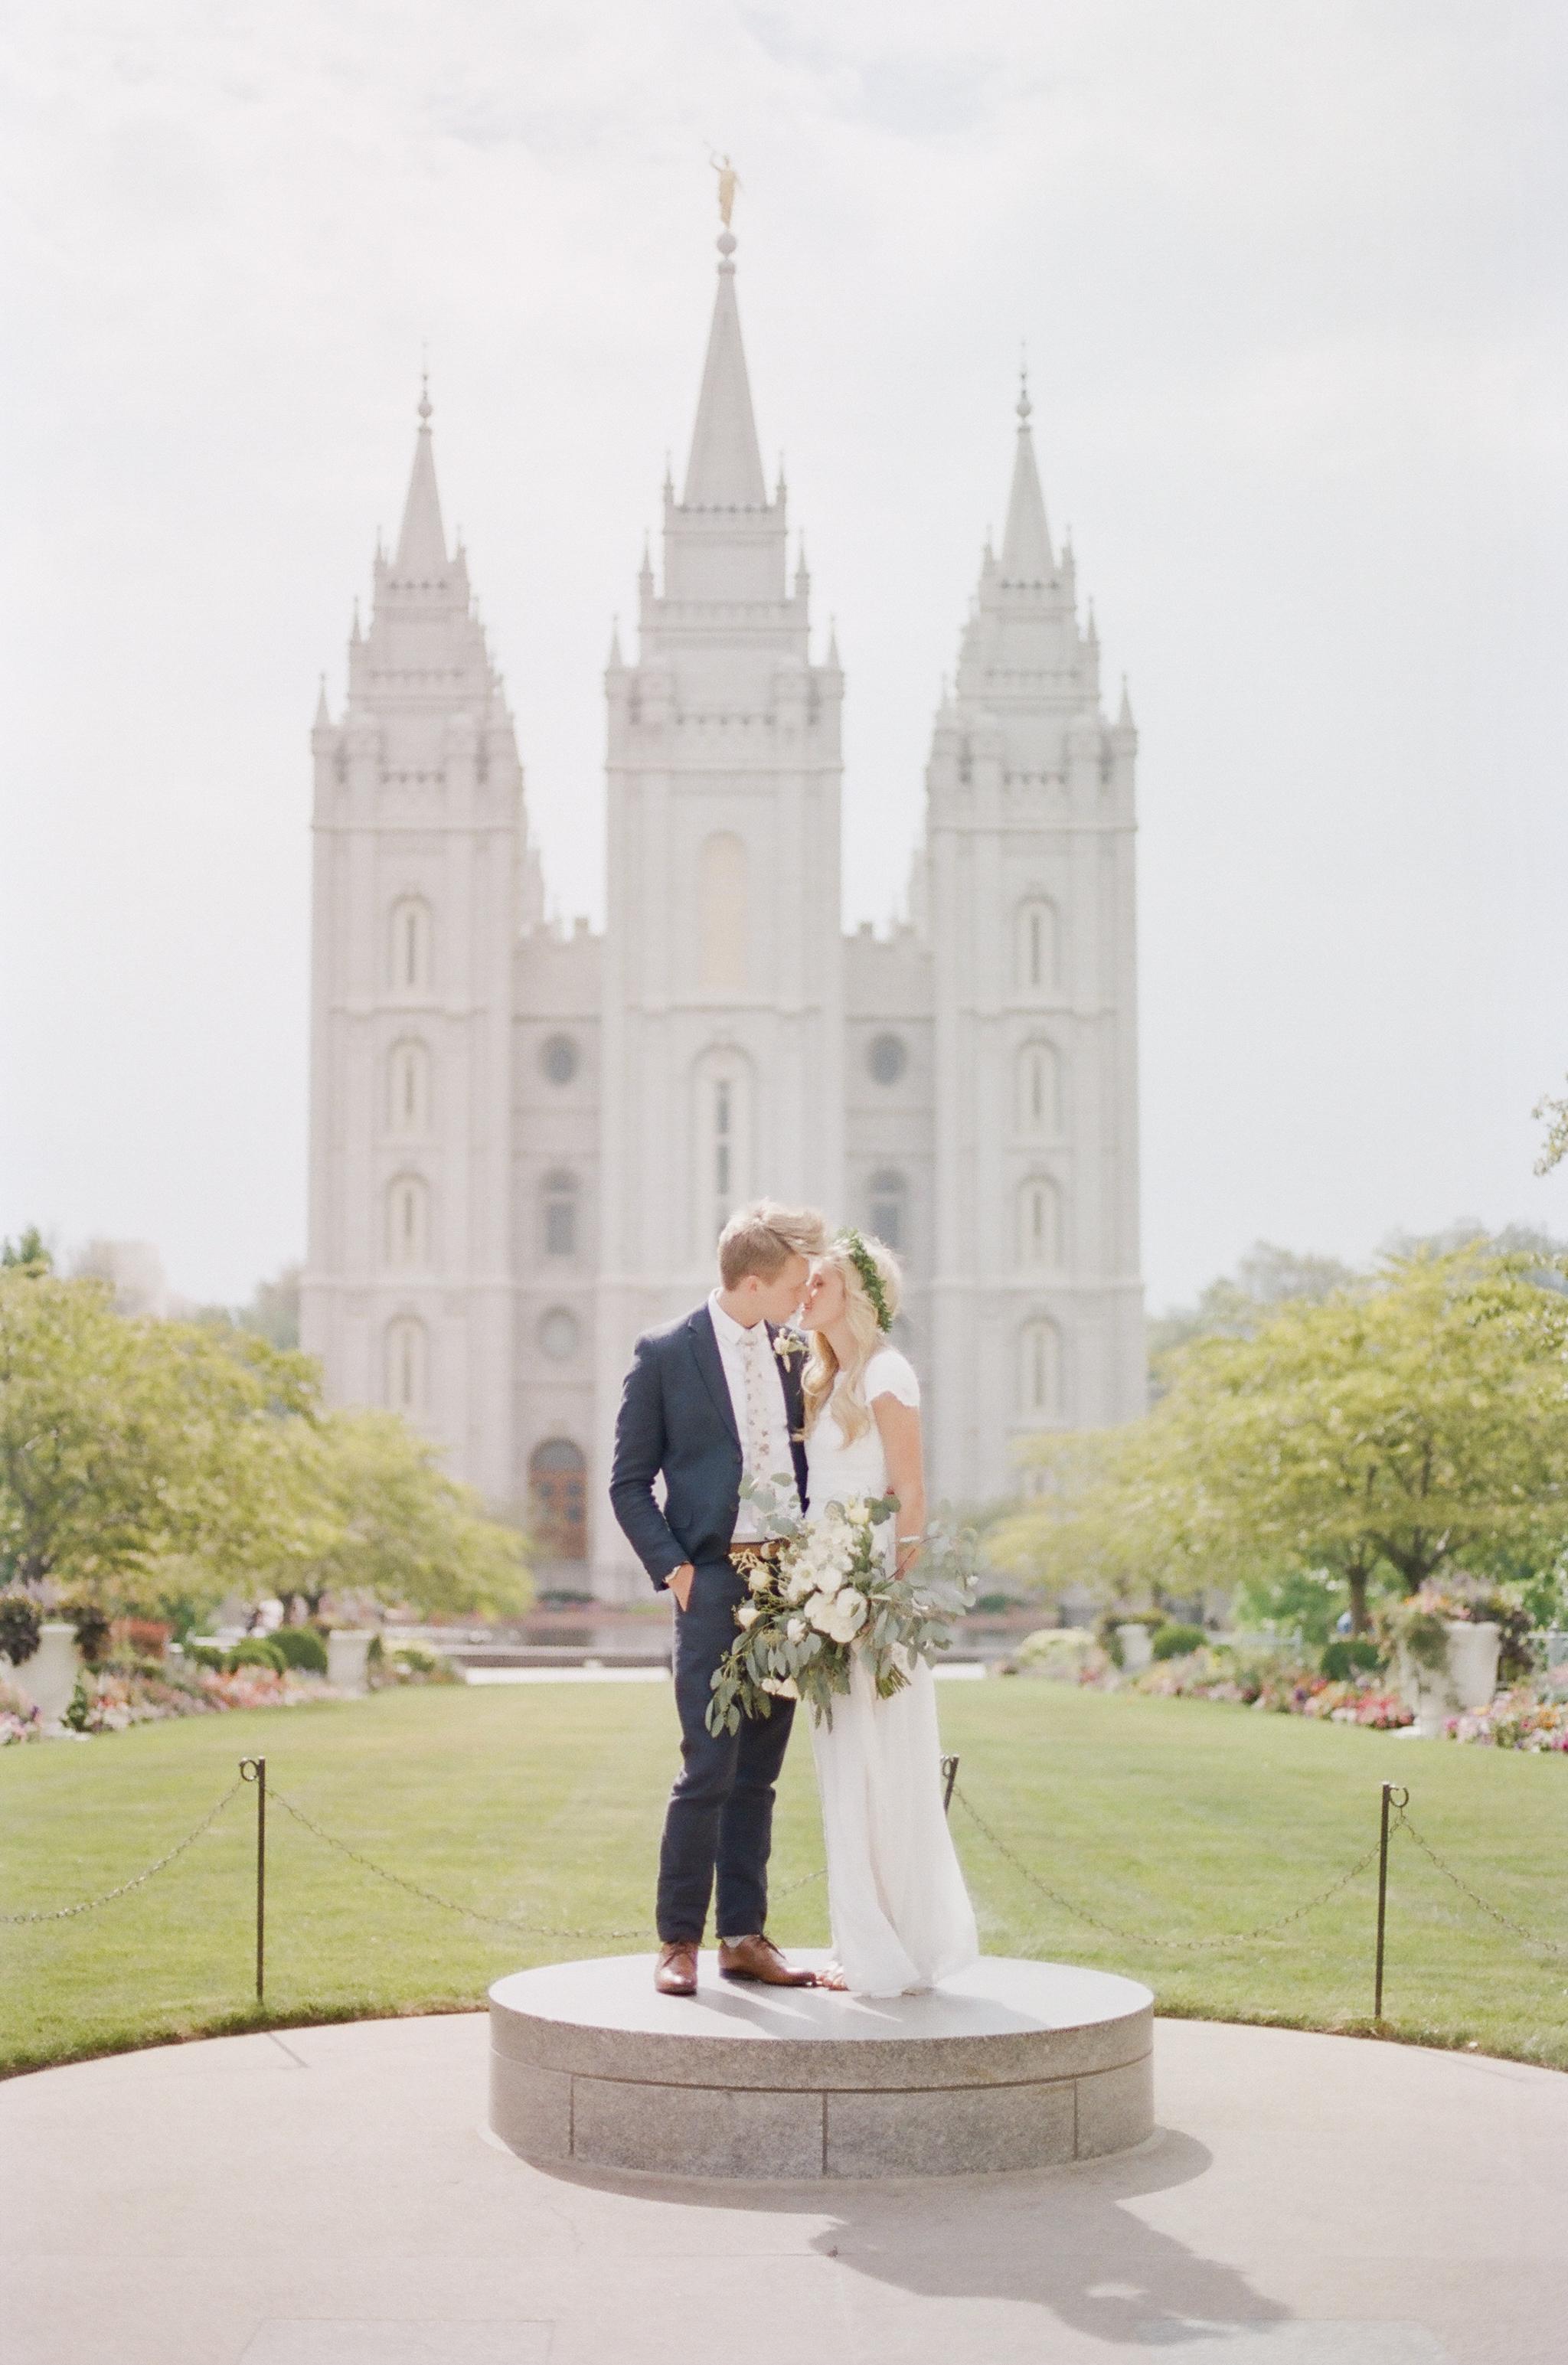 Wynona Benson Photography - Jaleisa & Logan Romantic Elegant Utah Wedding00053.jpg